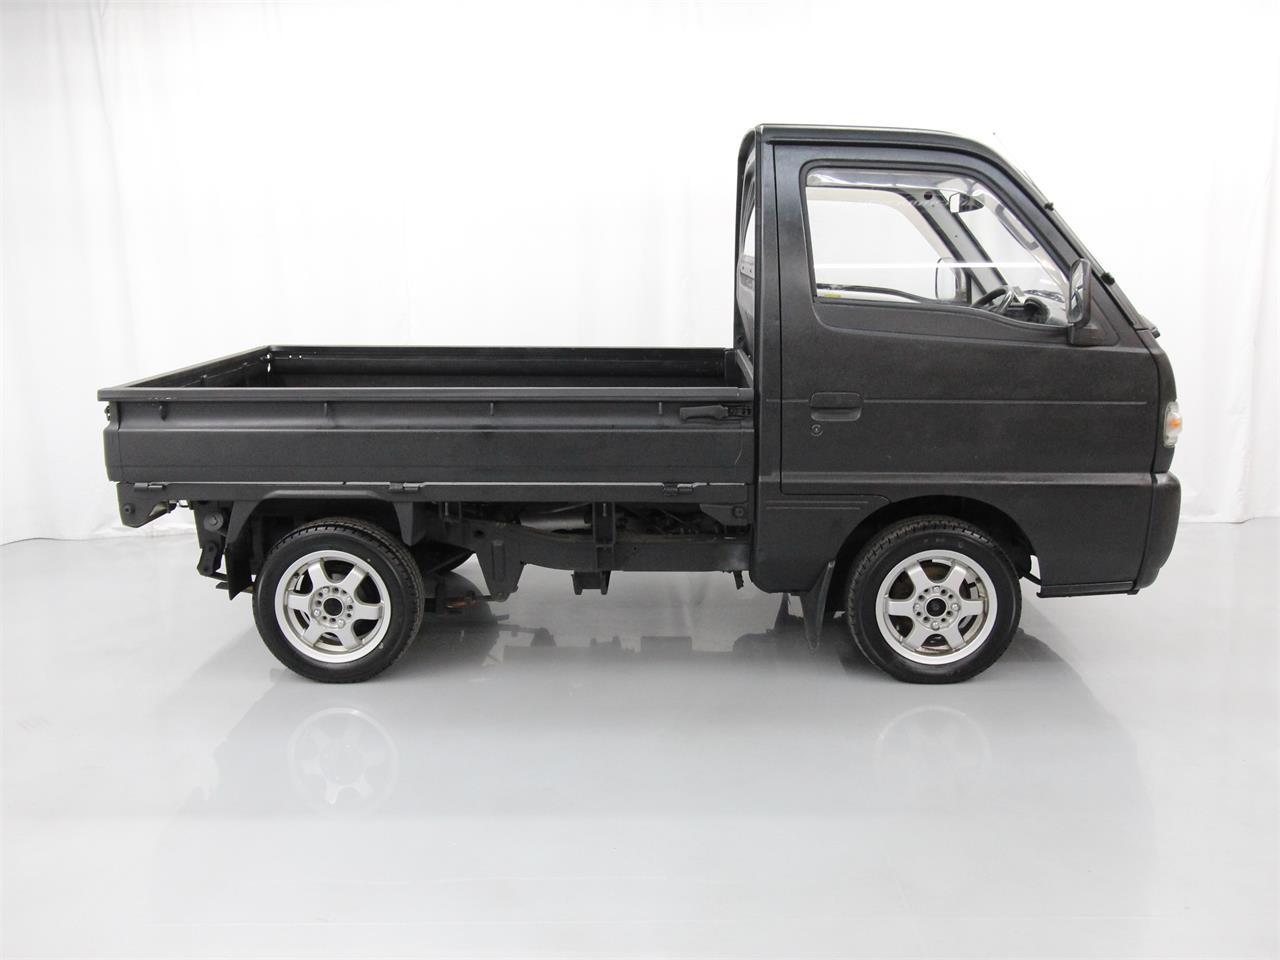 1993 Suzuki Carry (CC-1302281) for sale in Christiansburg, Virginia